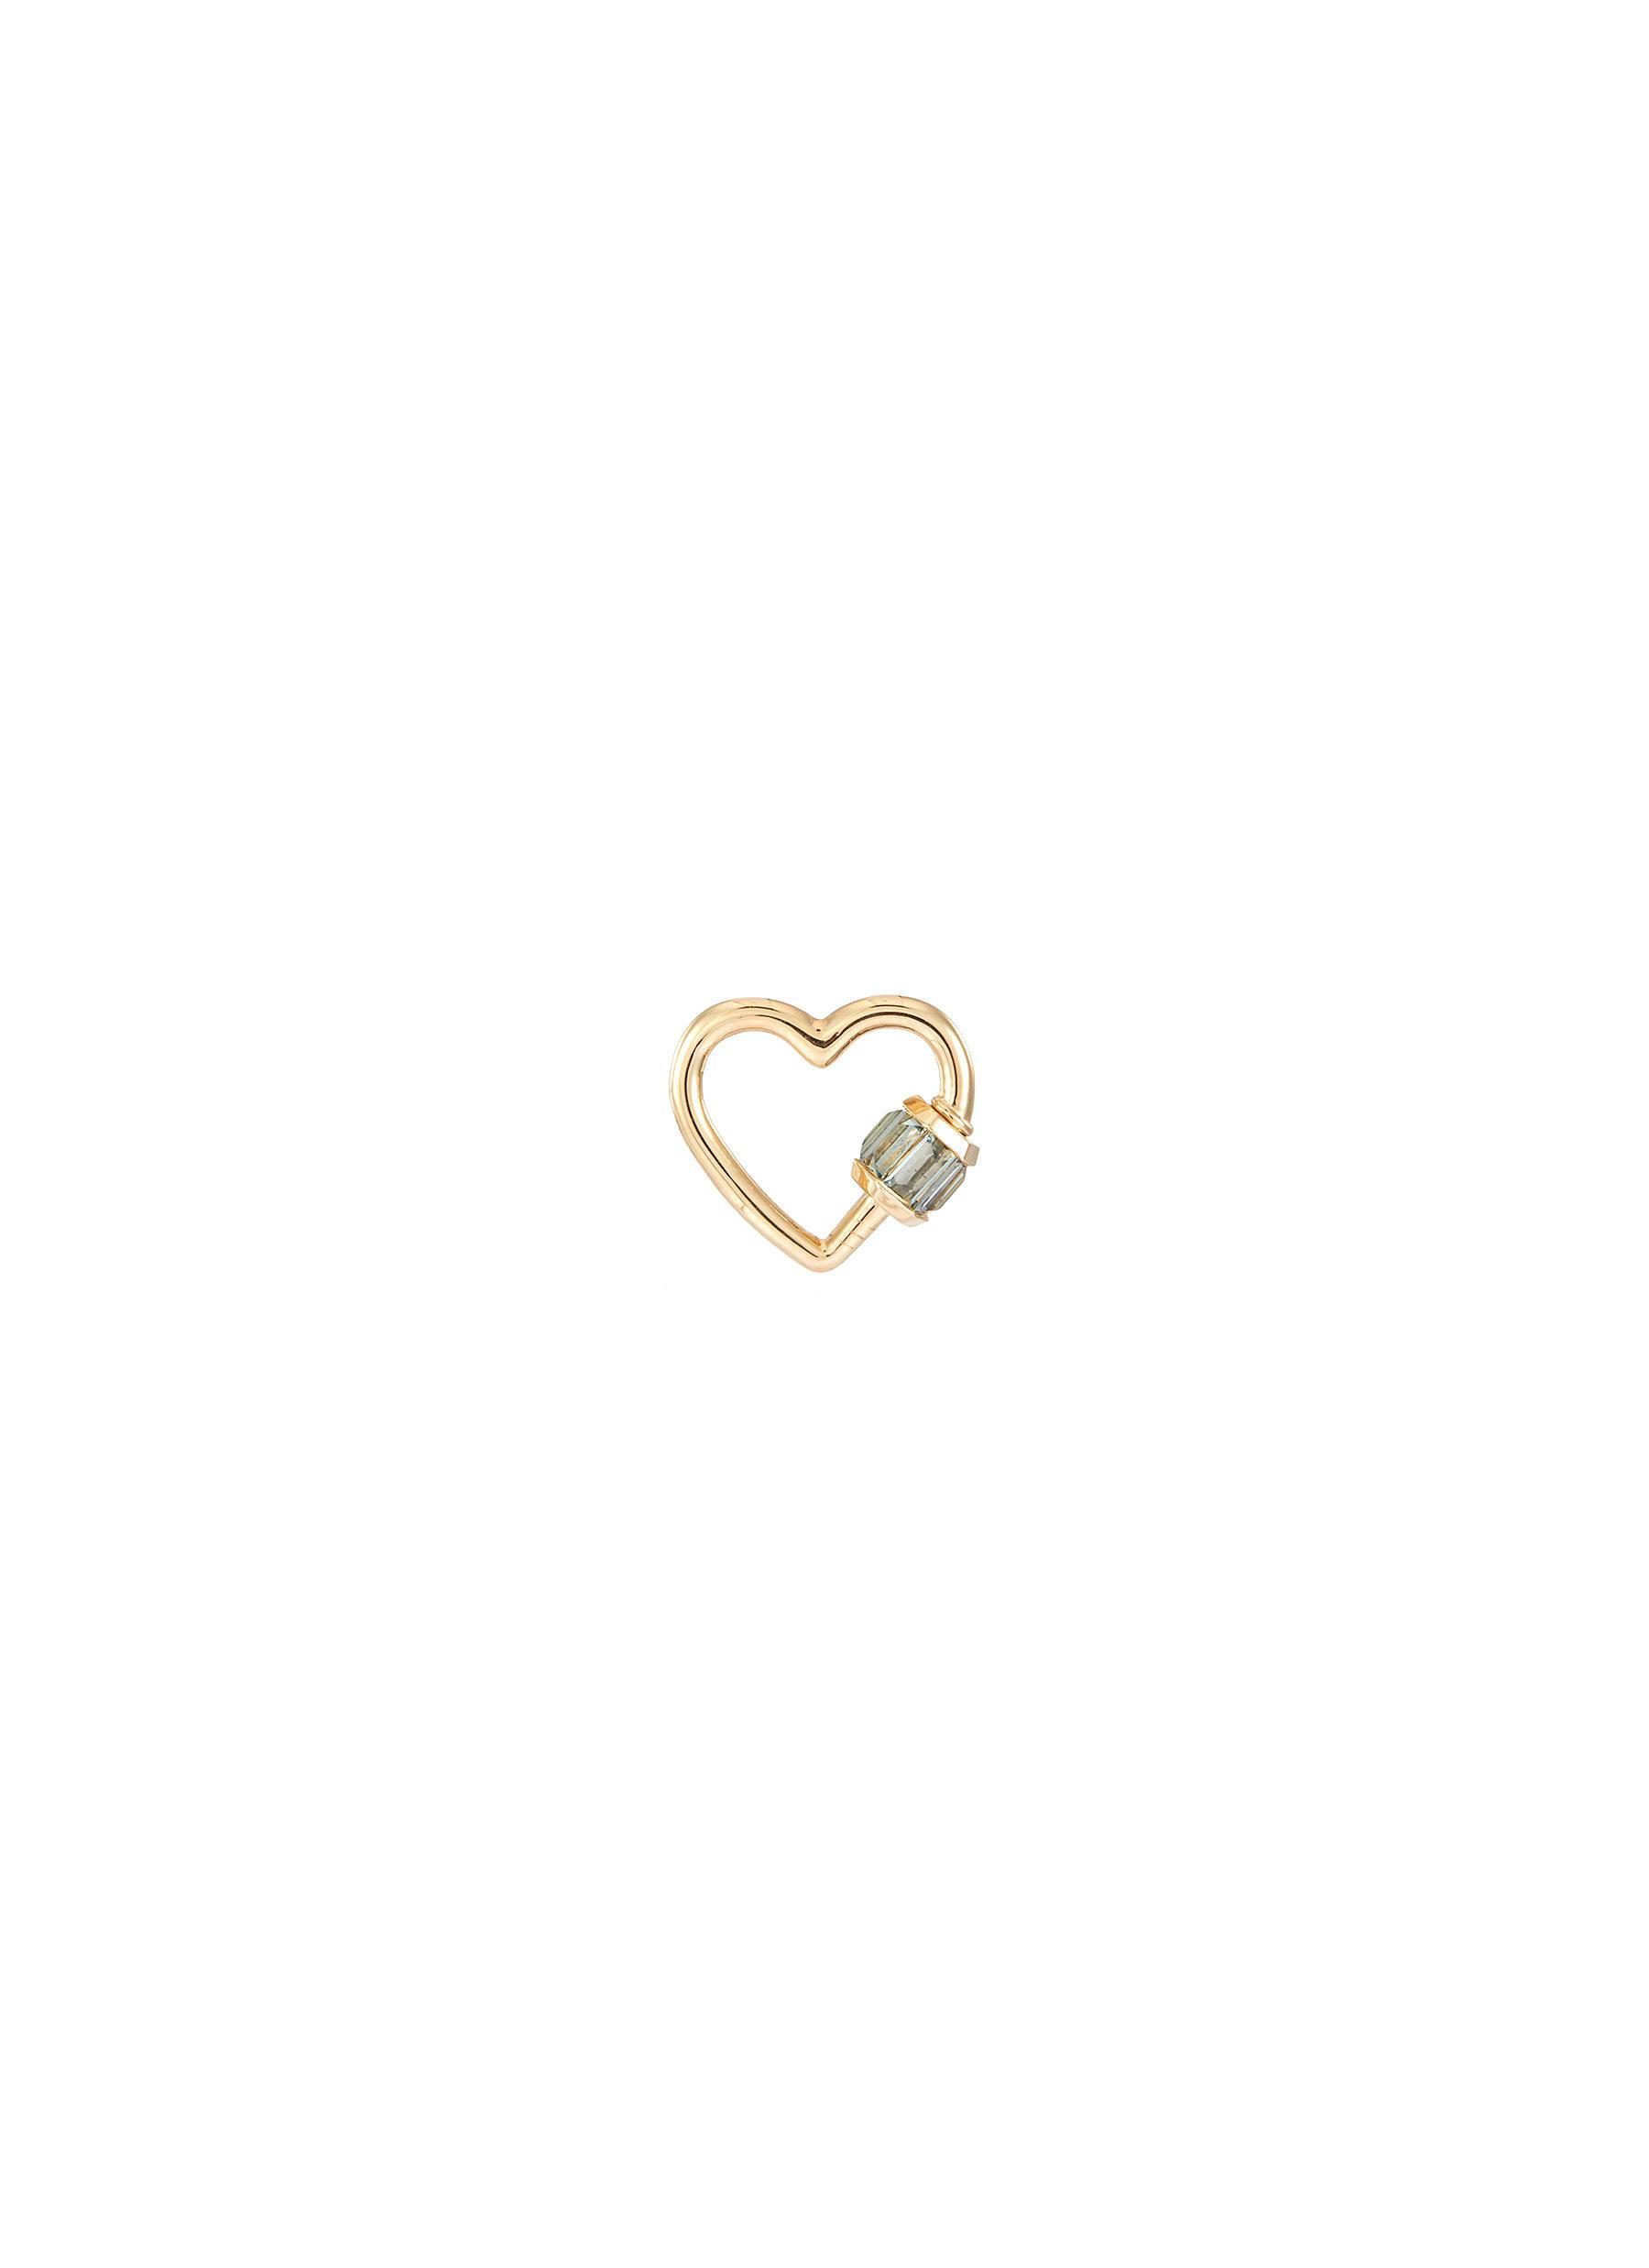 'Heart' sapphire 14k yellow gold baguette baby lock